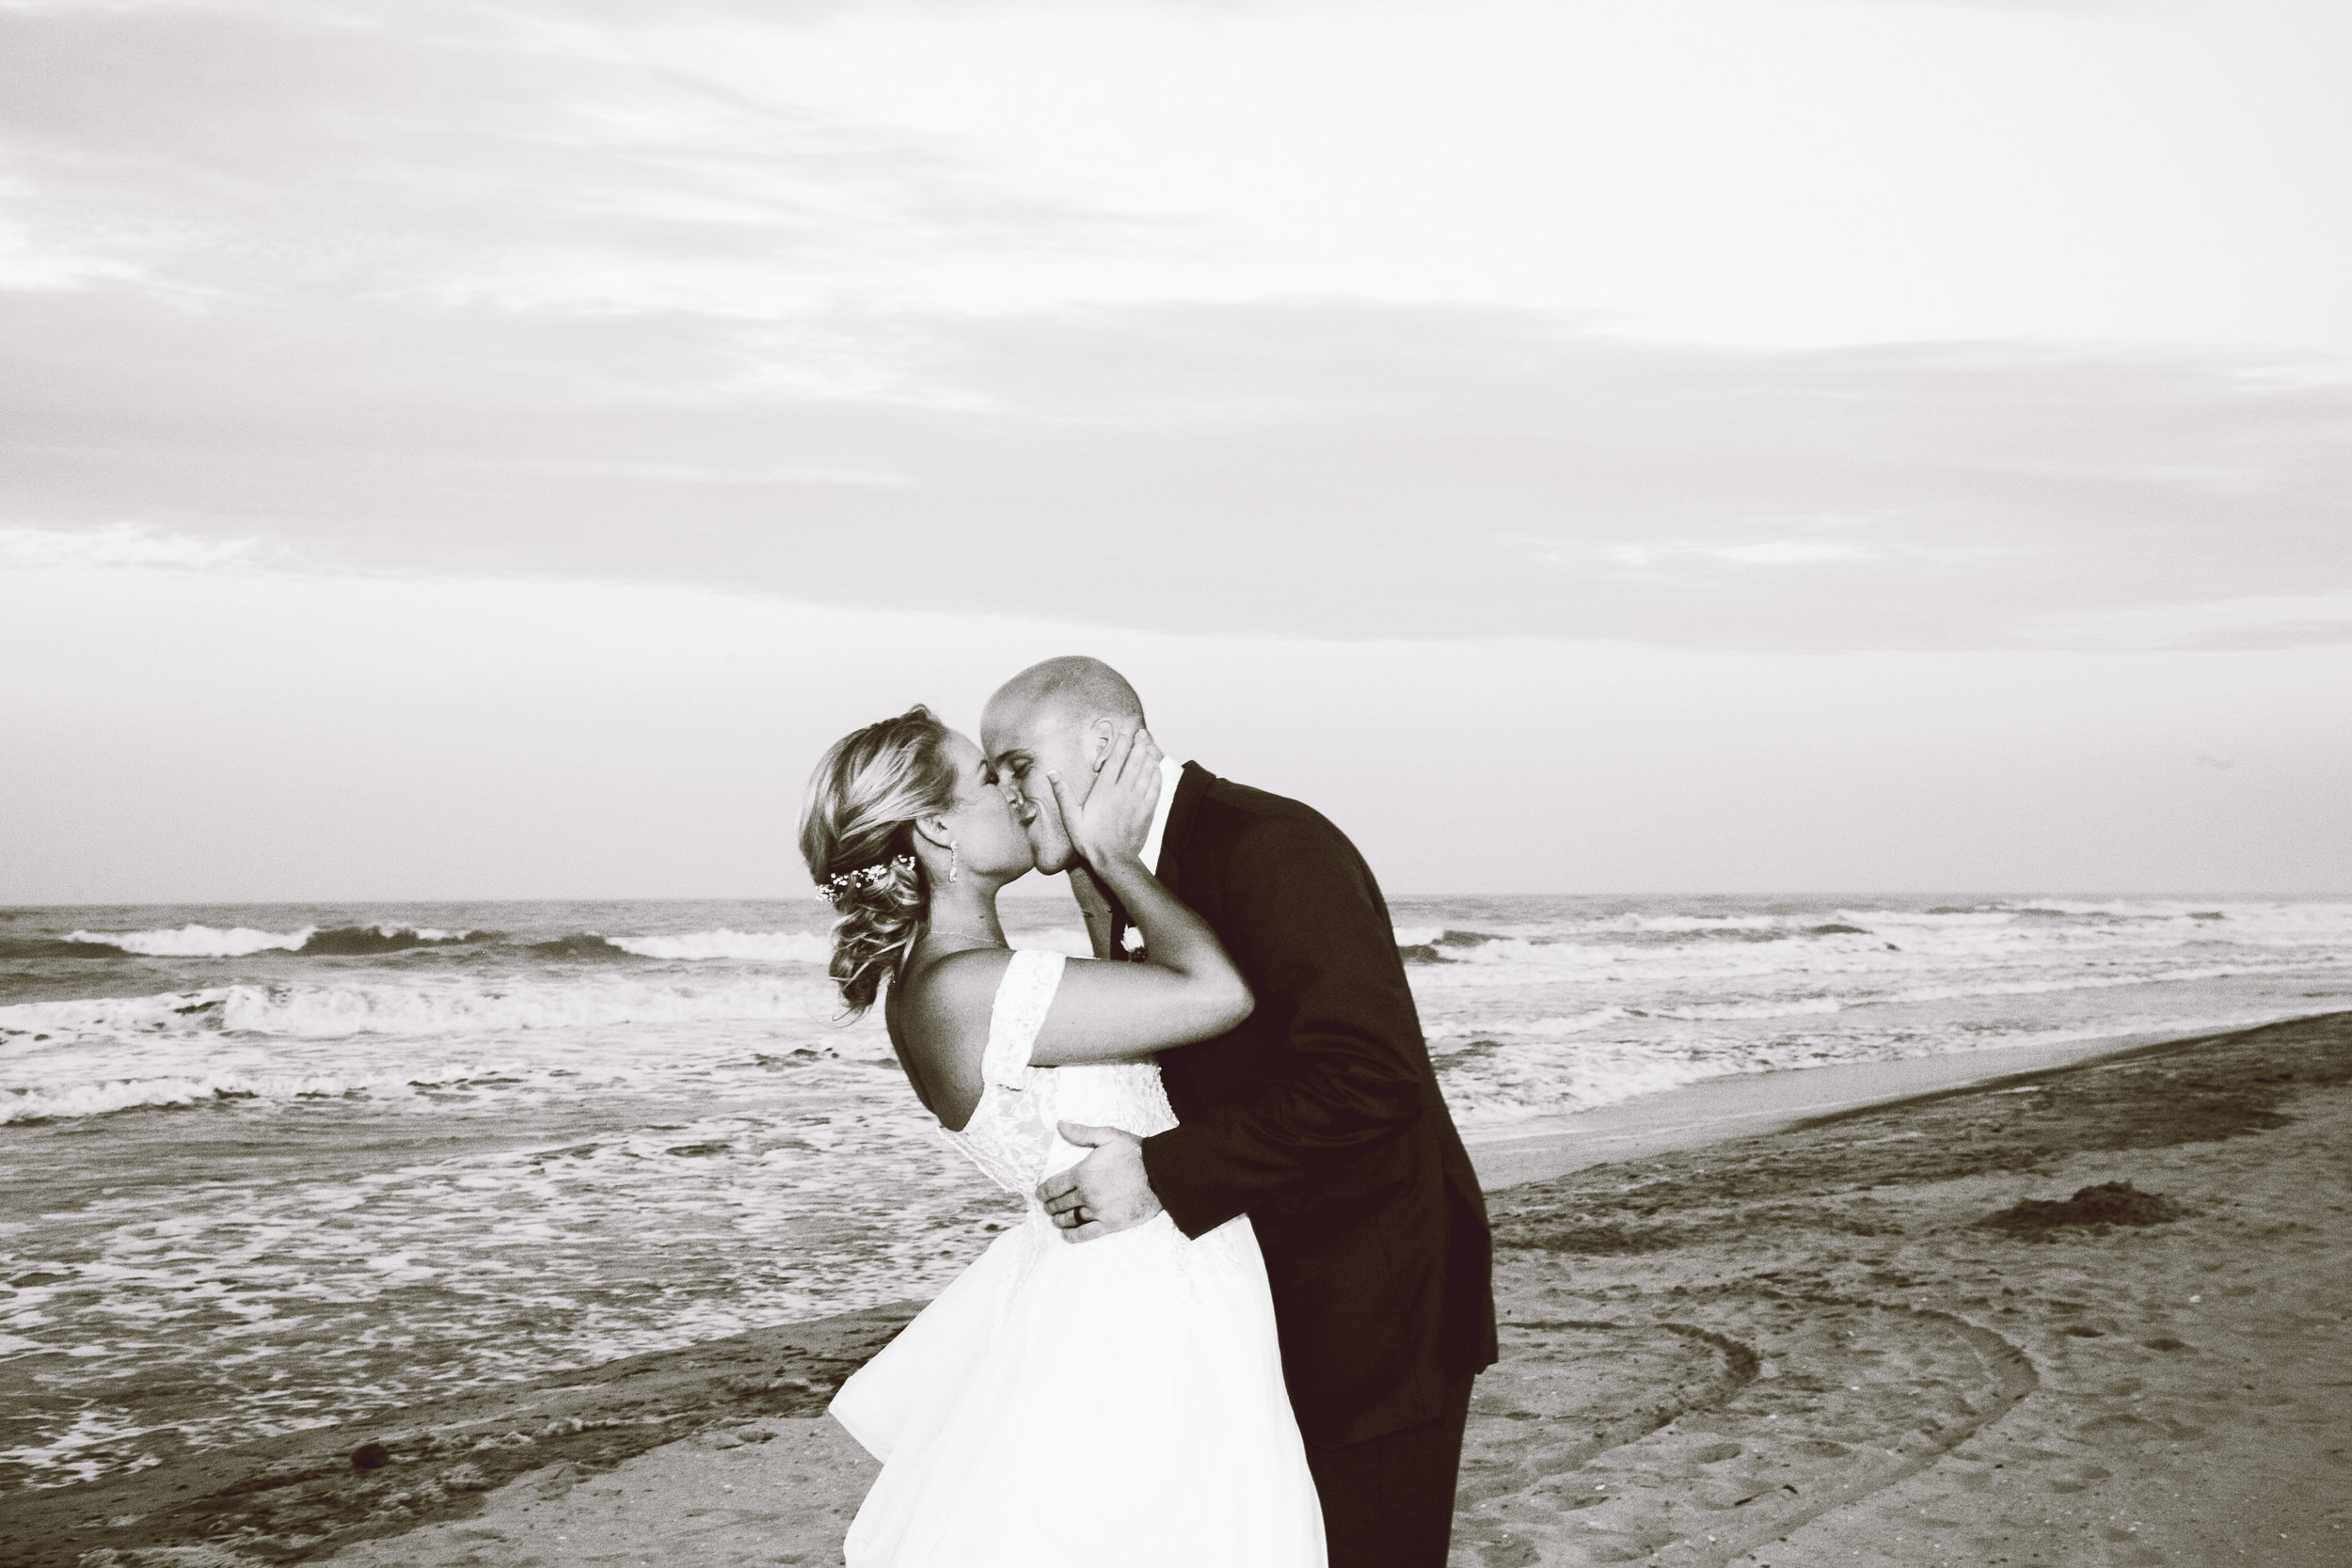 ICONA GOLDEN INN AVALON NJ WEDDING PHOTOGRAPHY  - 082.jpg